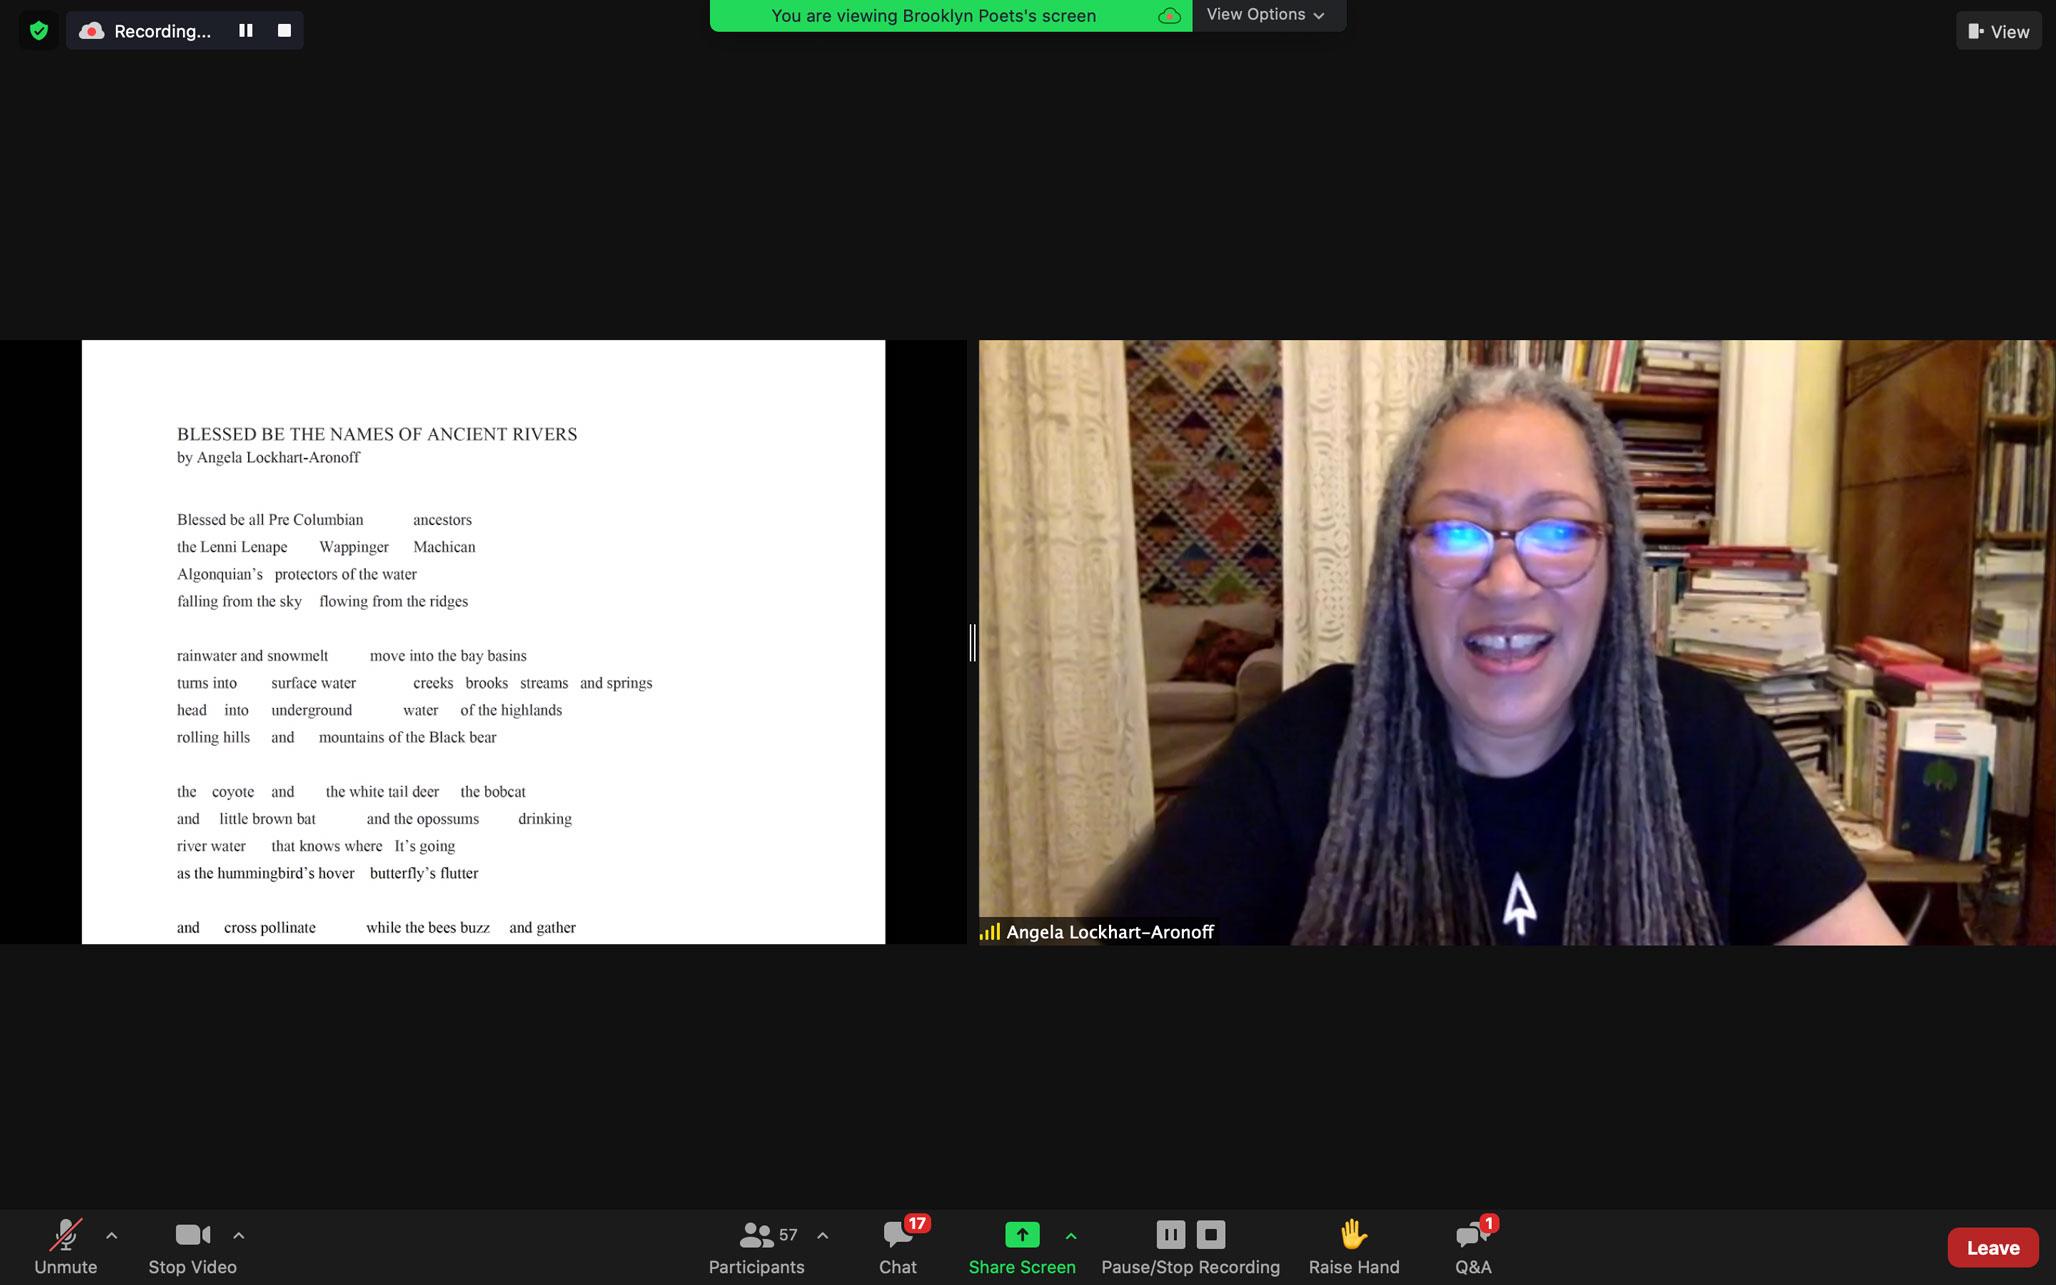 Angela Lockhart-Aronoff reads at Brooklyn Poets Workshop Showcase